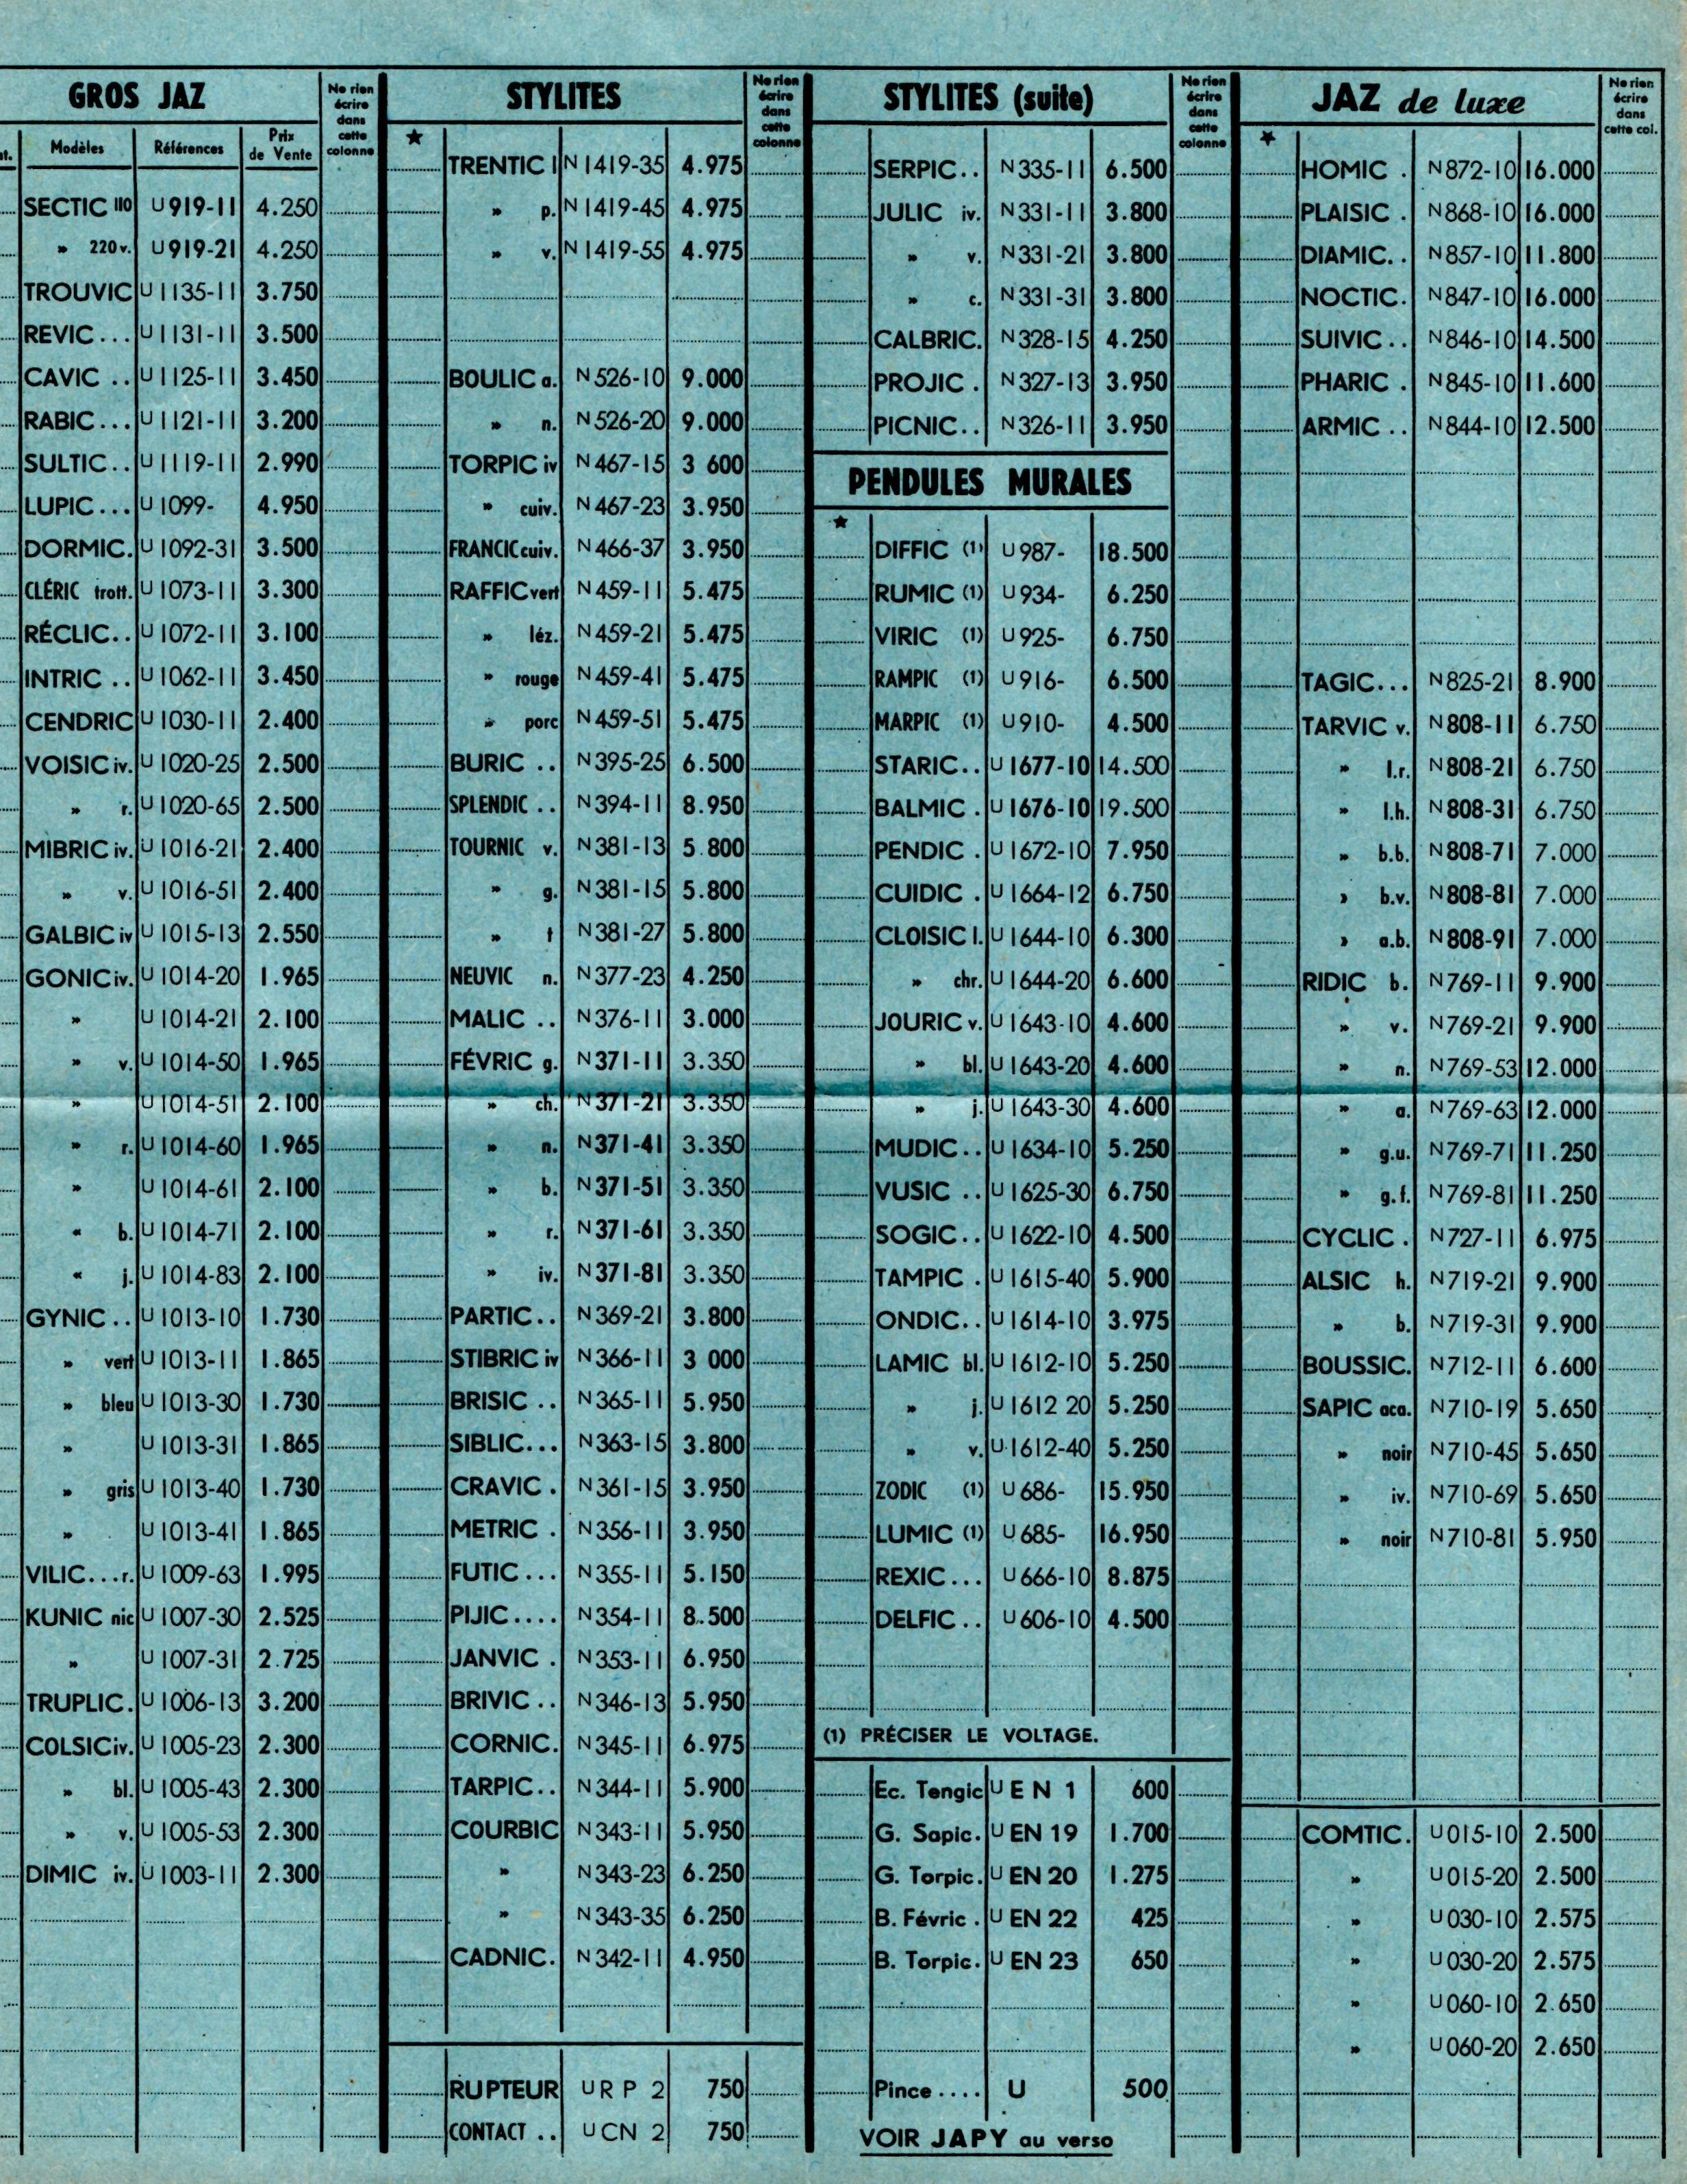 1957 bon de commande tarif FA 57 juillet 1957 page 2